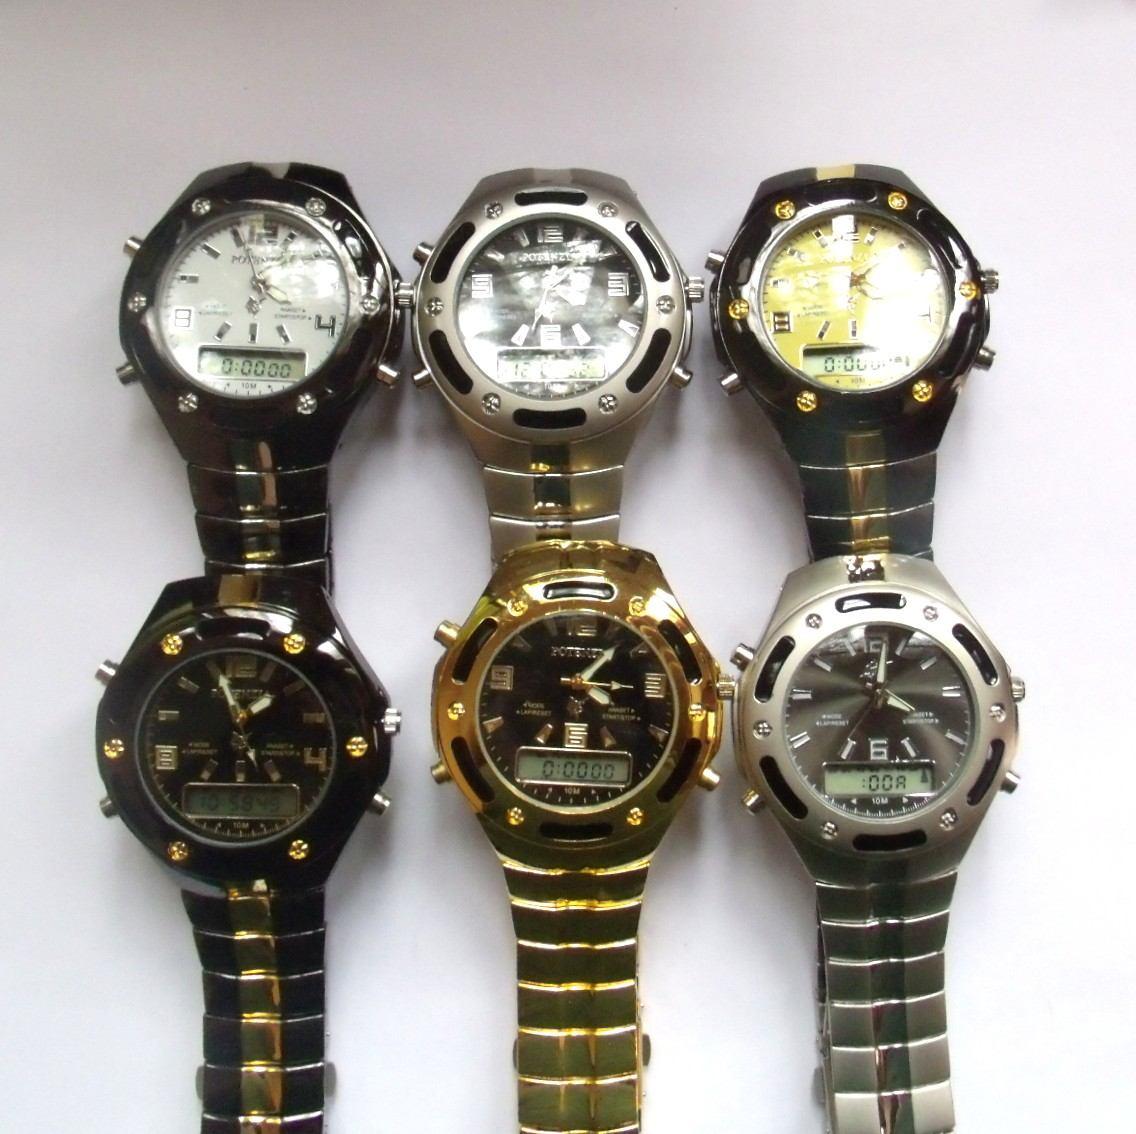 acf31276df7 Relógio Masculino Potenzia Digital E Analogic